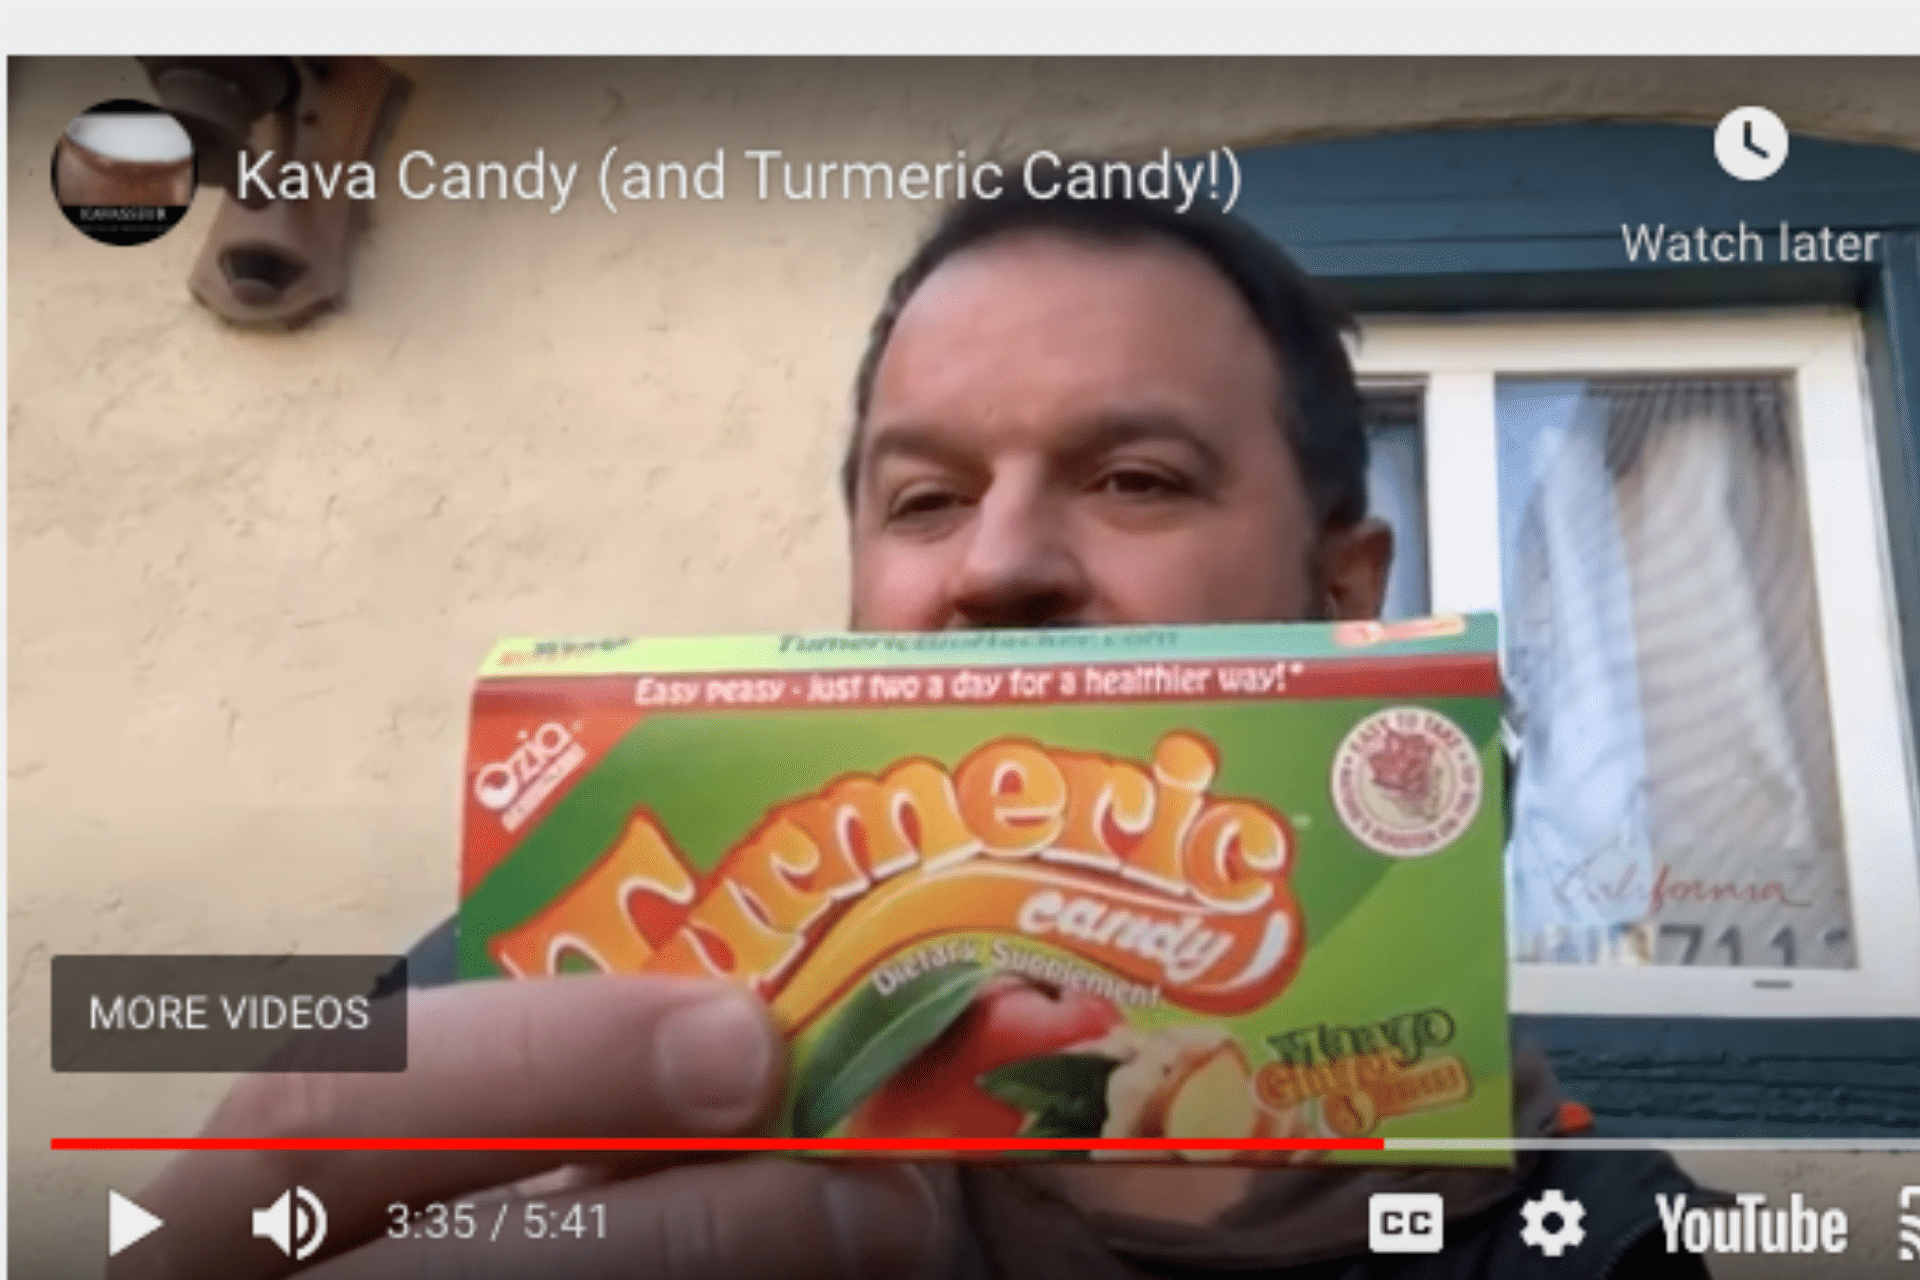 Kava Candy (and Turmeric Candy!) by The Kavasseur Kava Aficionado